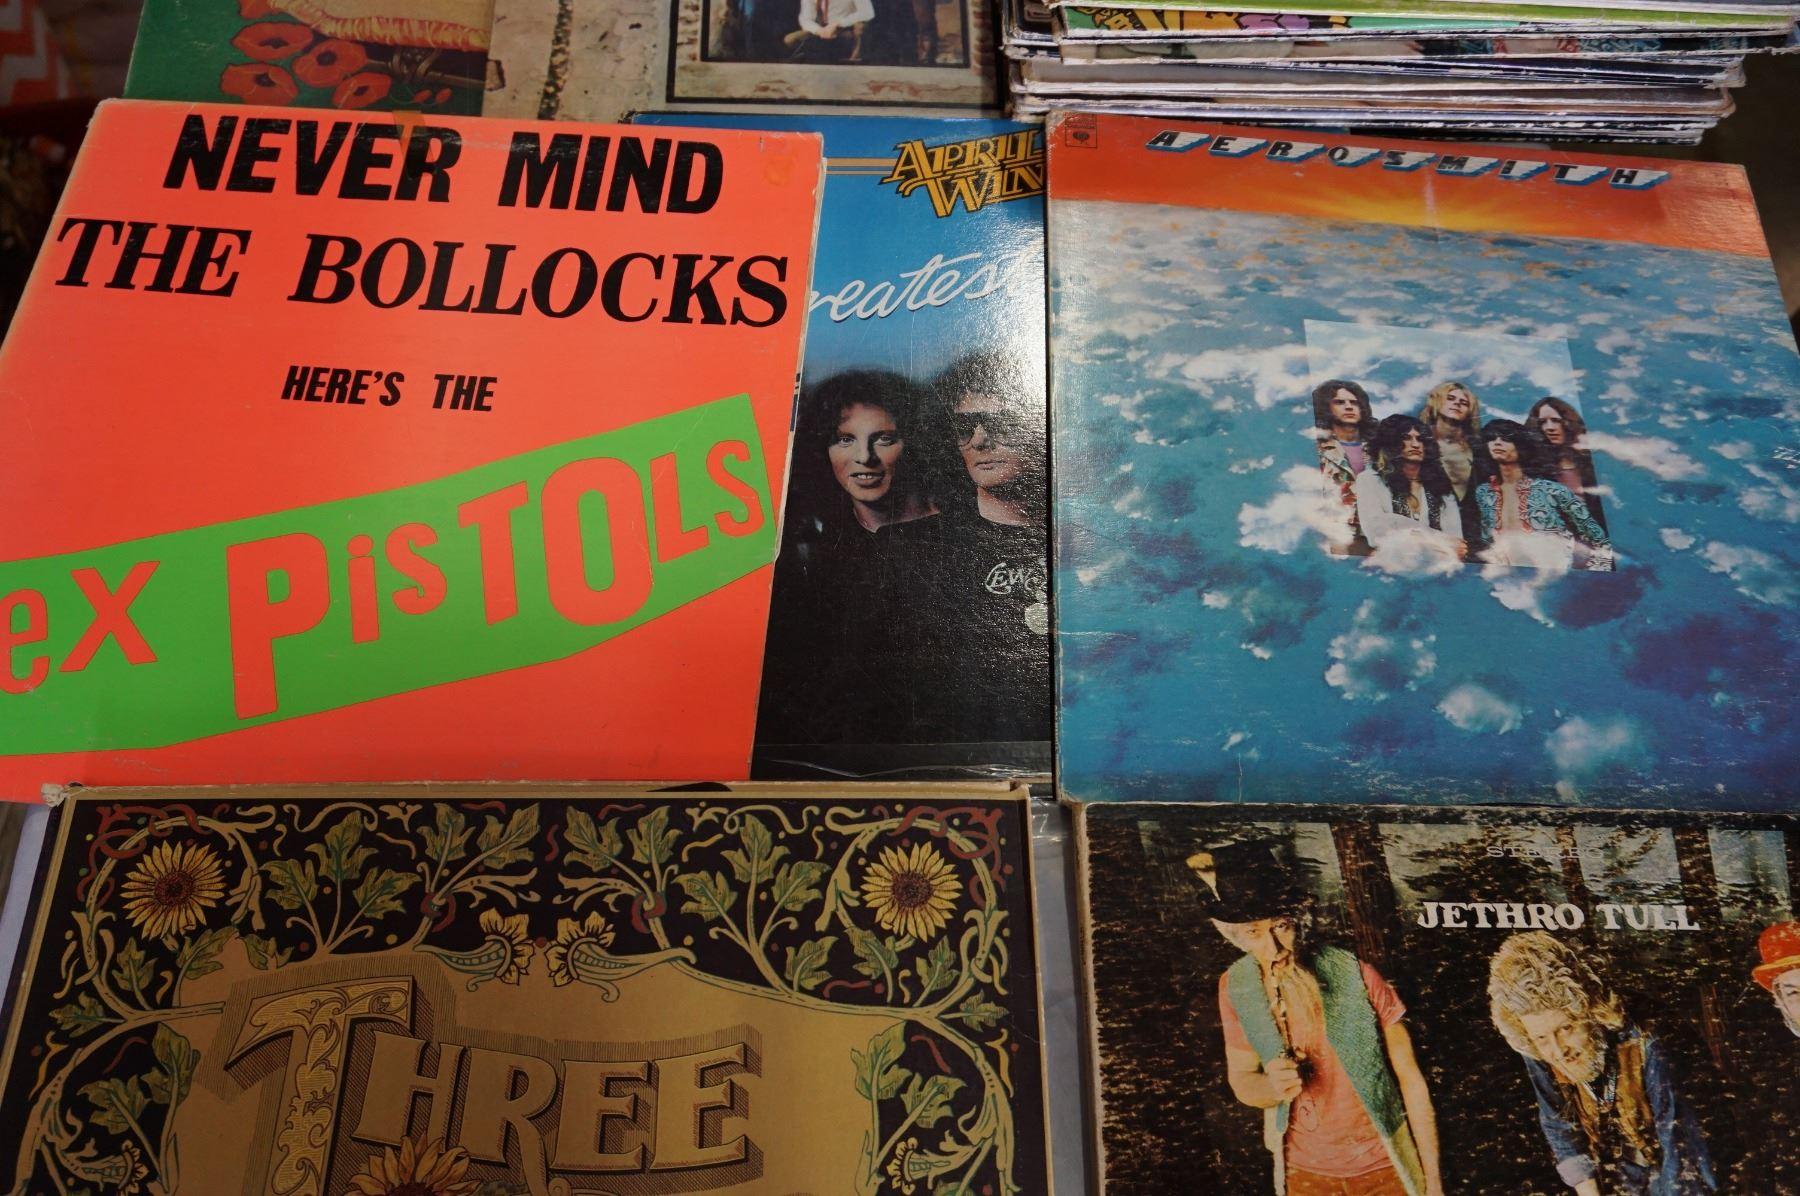 RARE 1960S ROCK N ROLL RECORDS